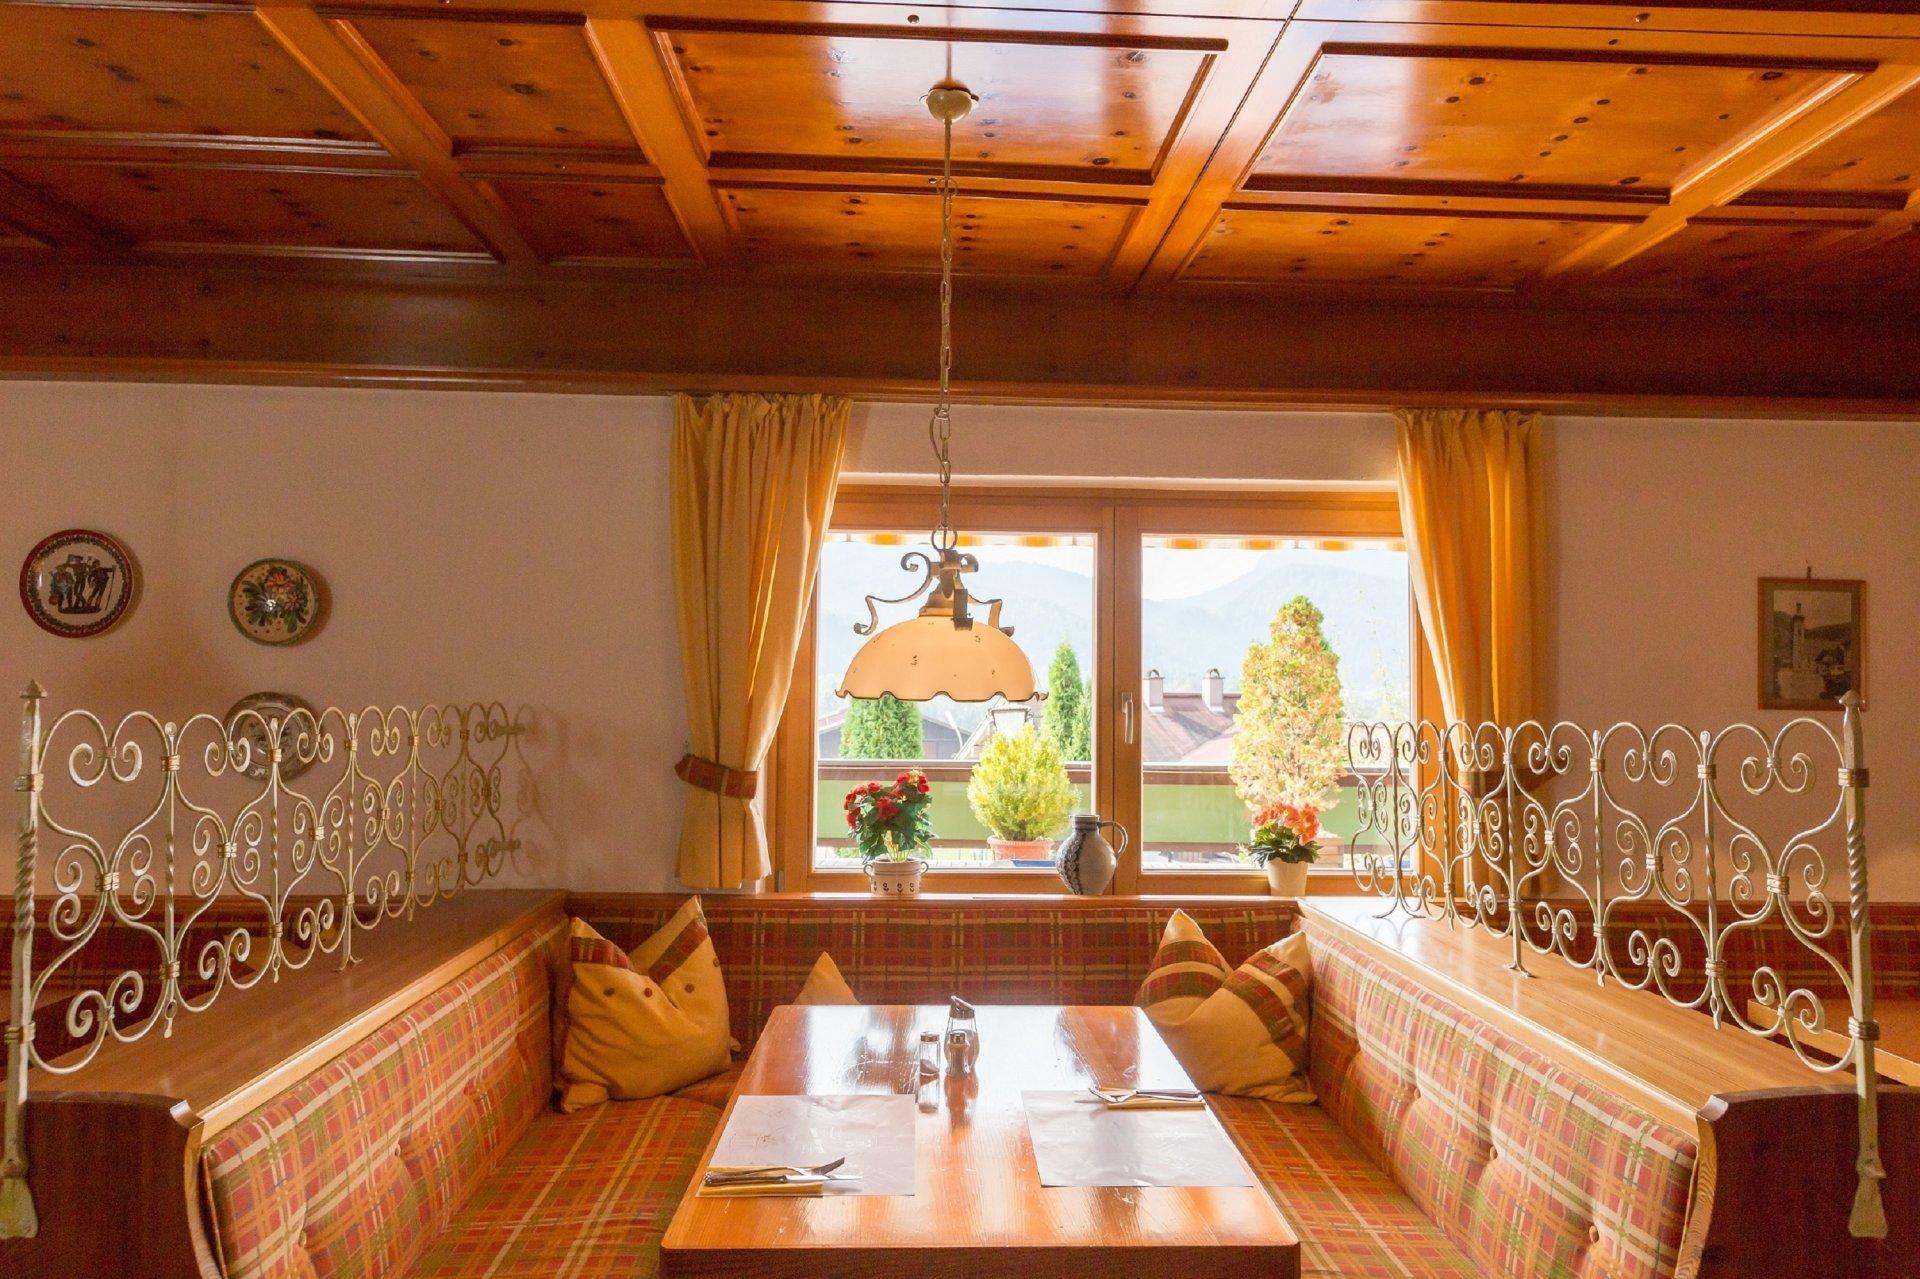 Deva Suite Hotel Villa Mittermaier